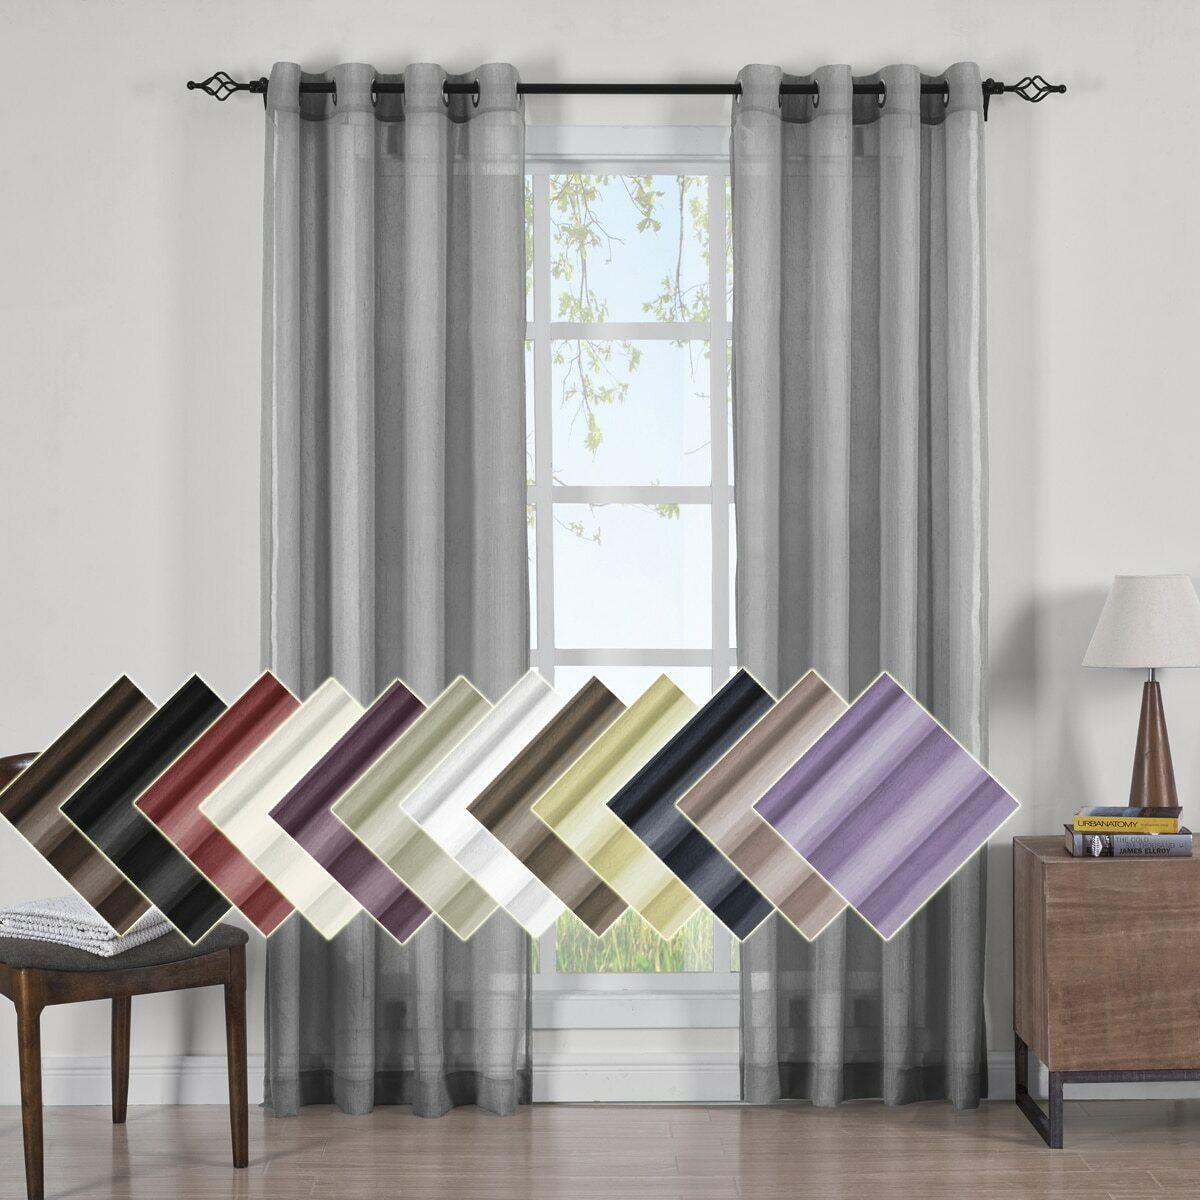 Set of 2 Abri Grommet Crushed Sheer Solid Window Curtain Pan